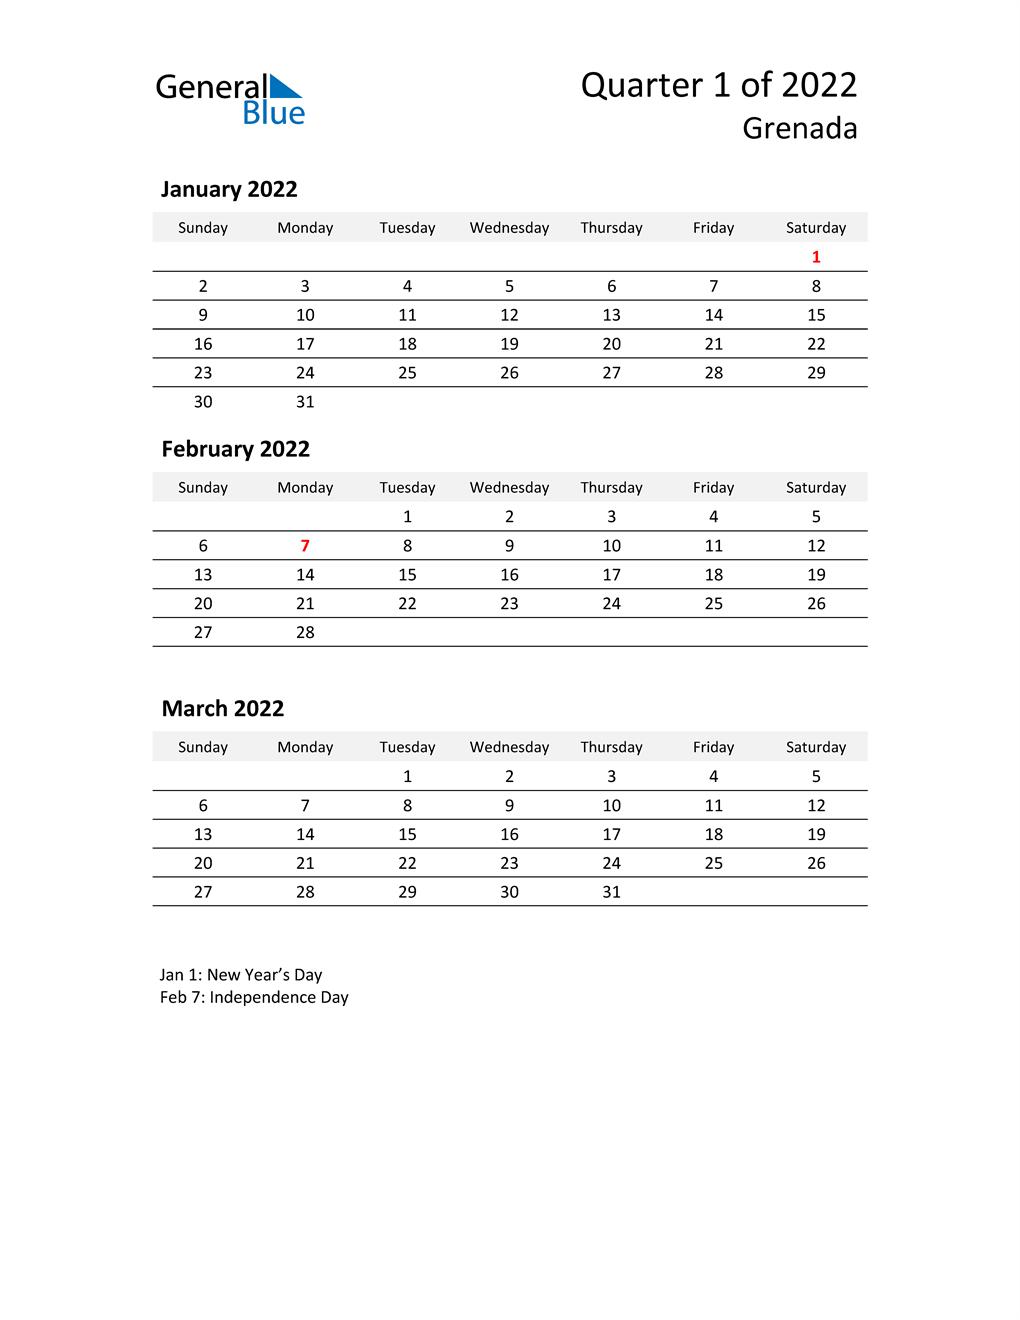 2022 Three-Month Calendar for Grenada